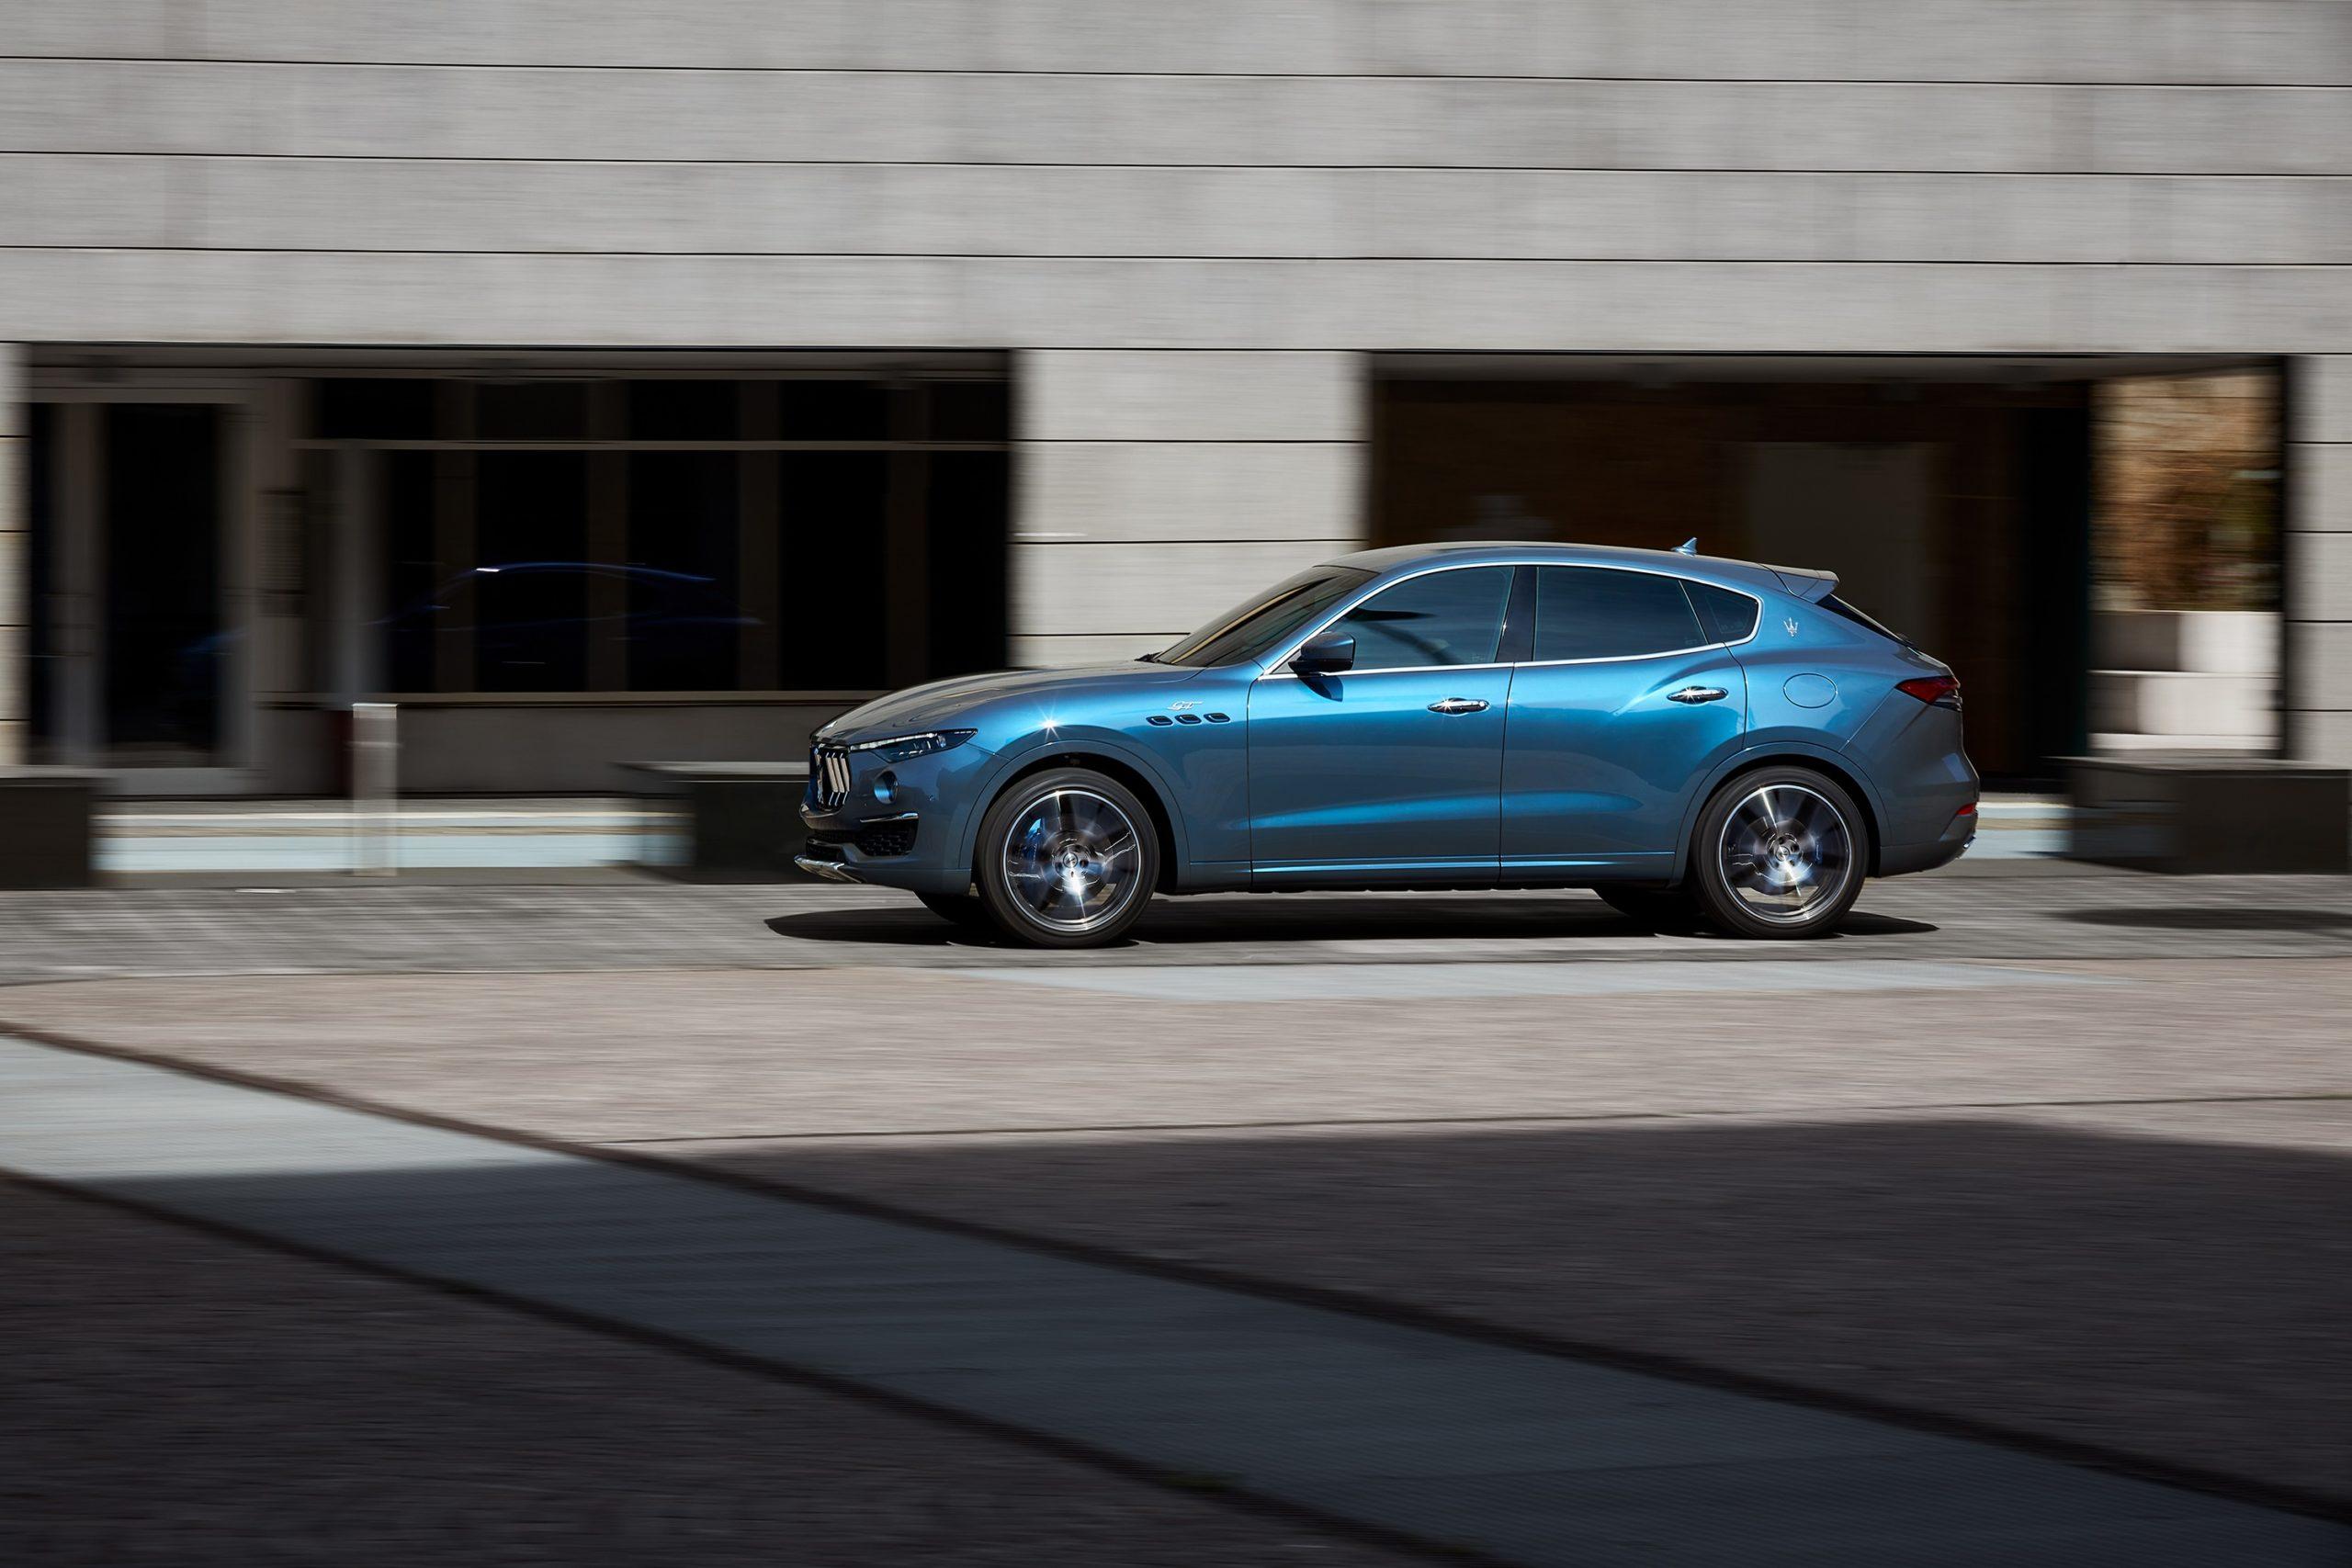 Maserati Levante Hybrid : Soon to arrive 'Affordable Maserati'?